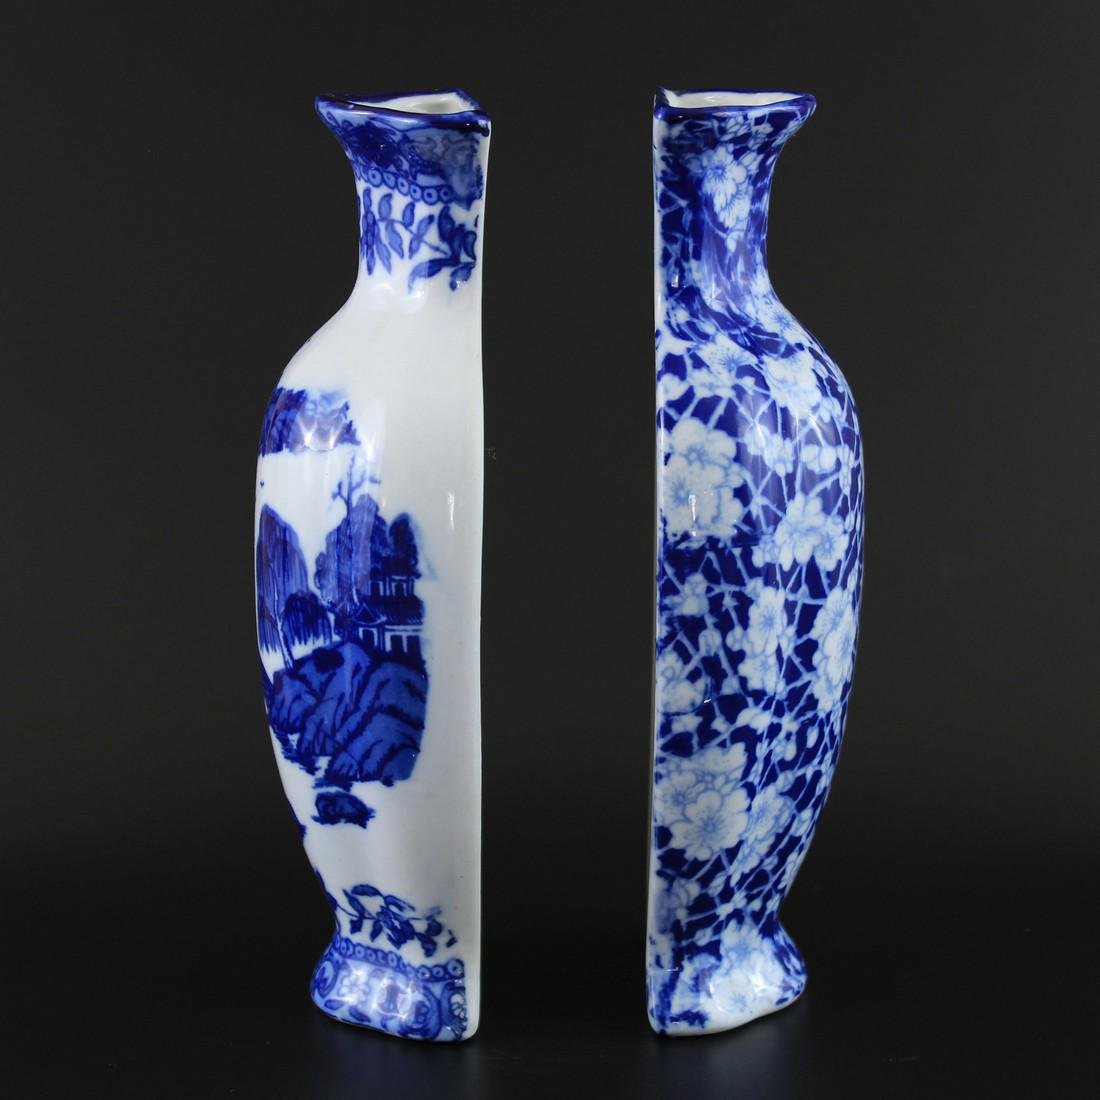 2 Vintage Chinese Blue & White Porcelain Wall Vases - 2